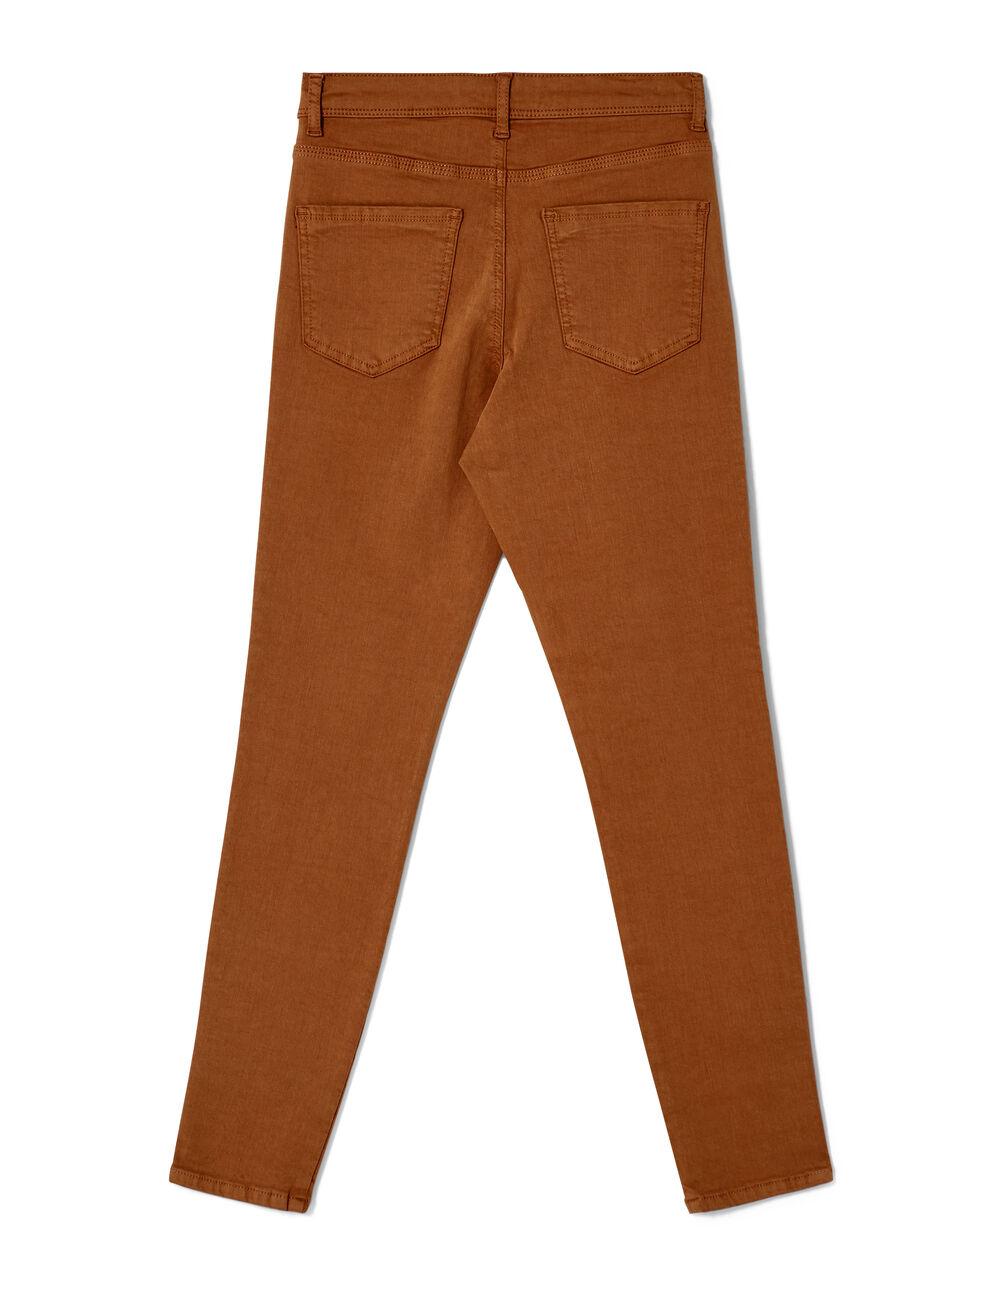 41cf1d5753 Camel Skinny Dress Pants